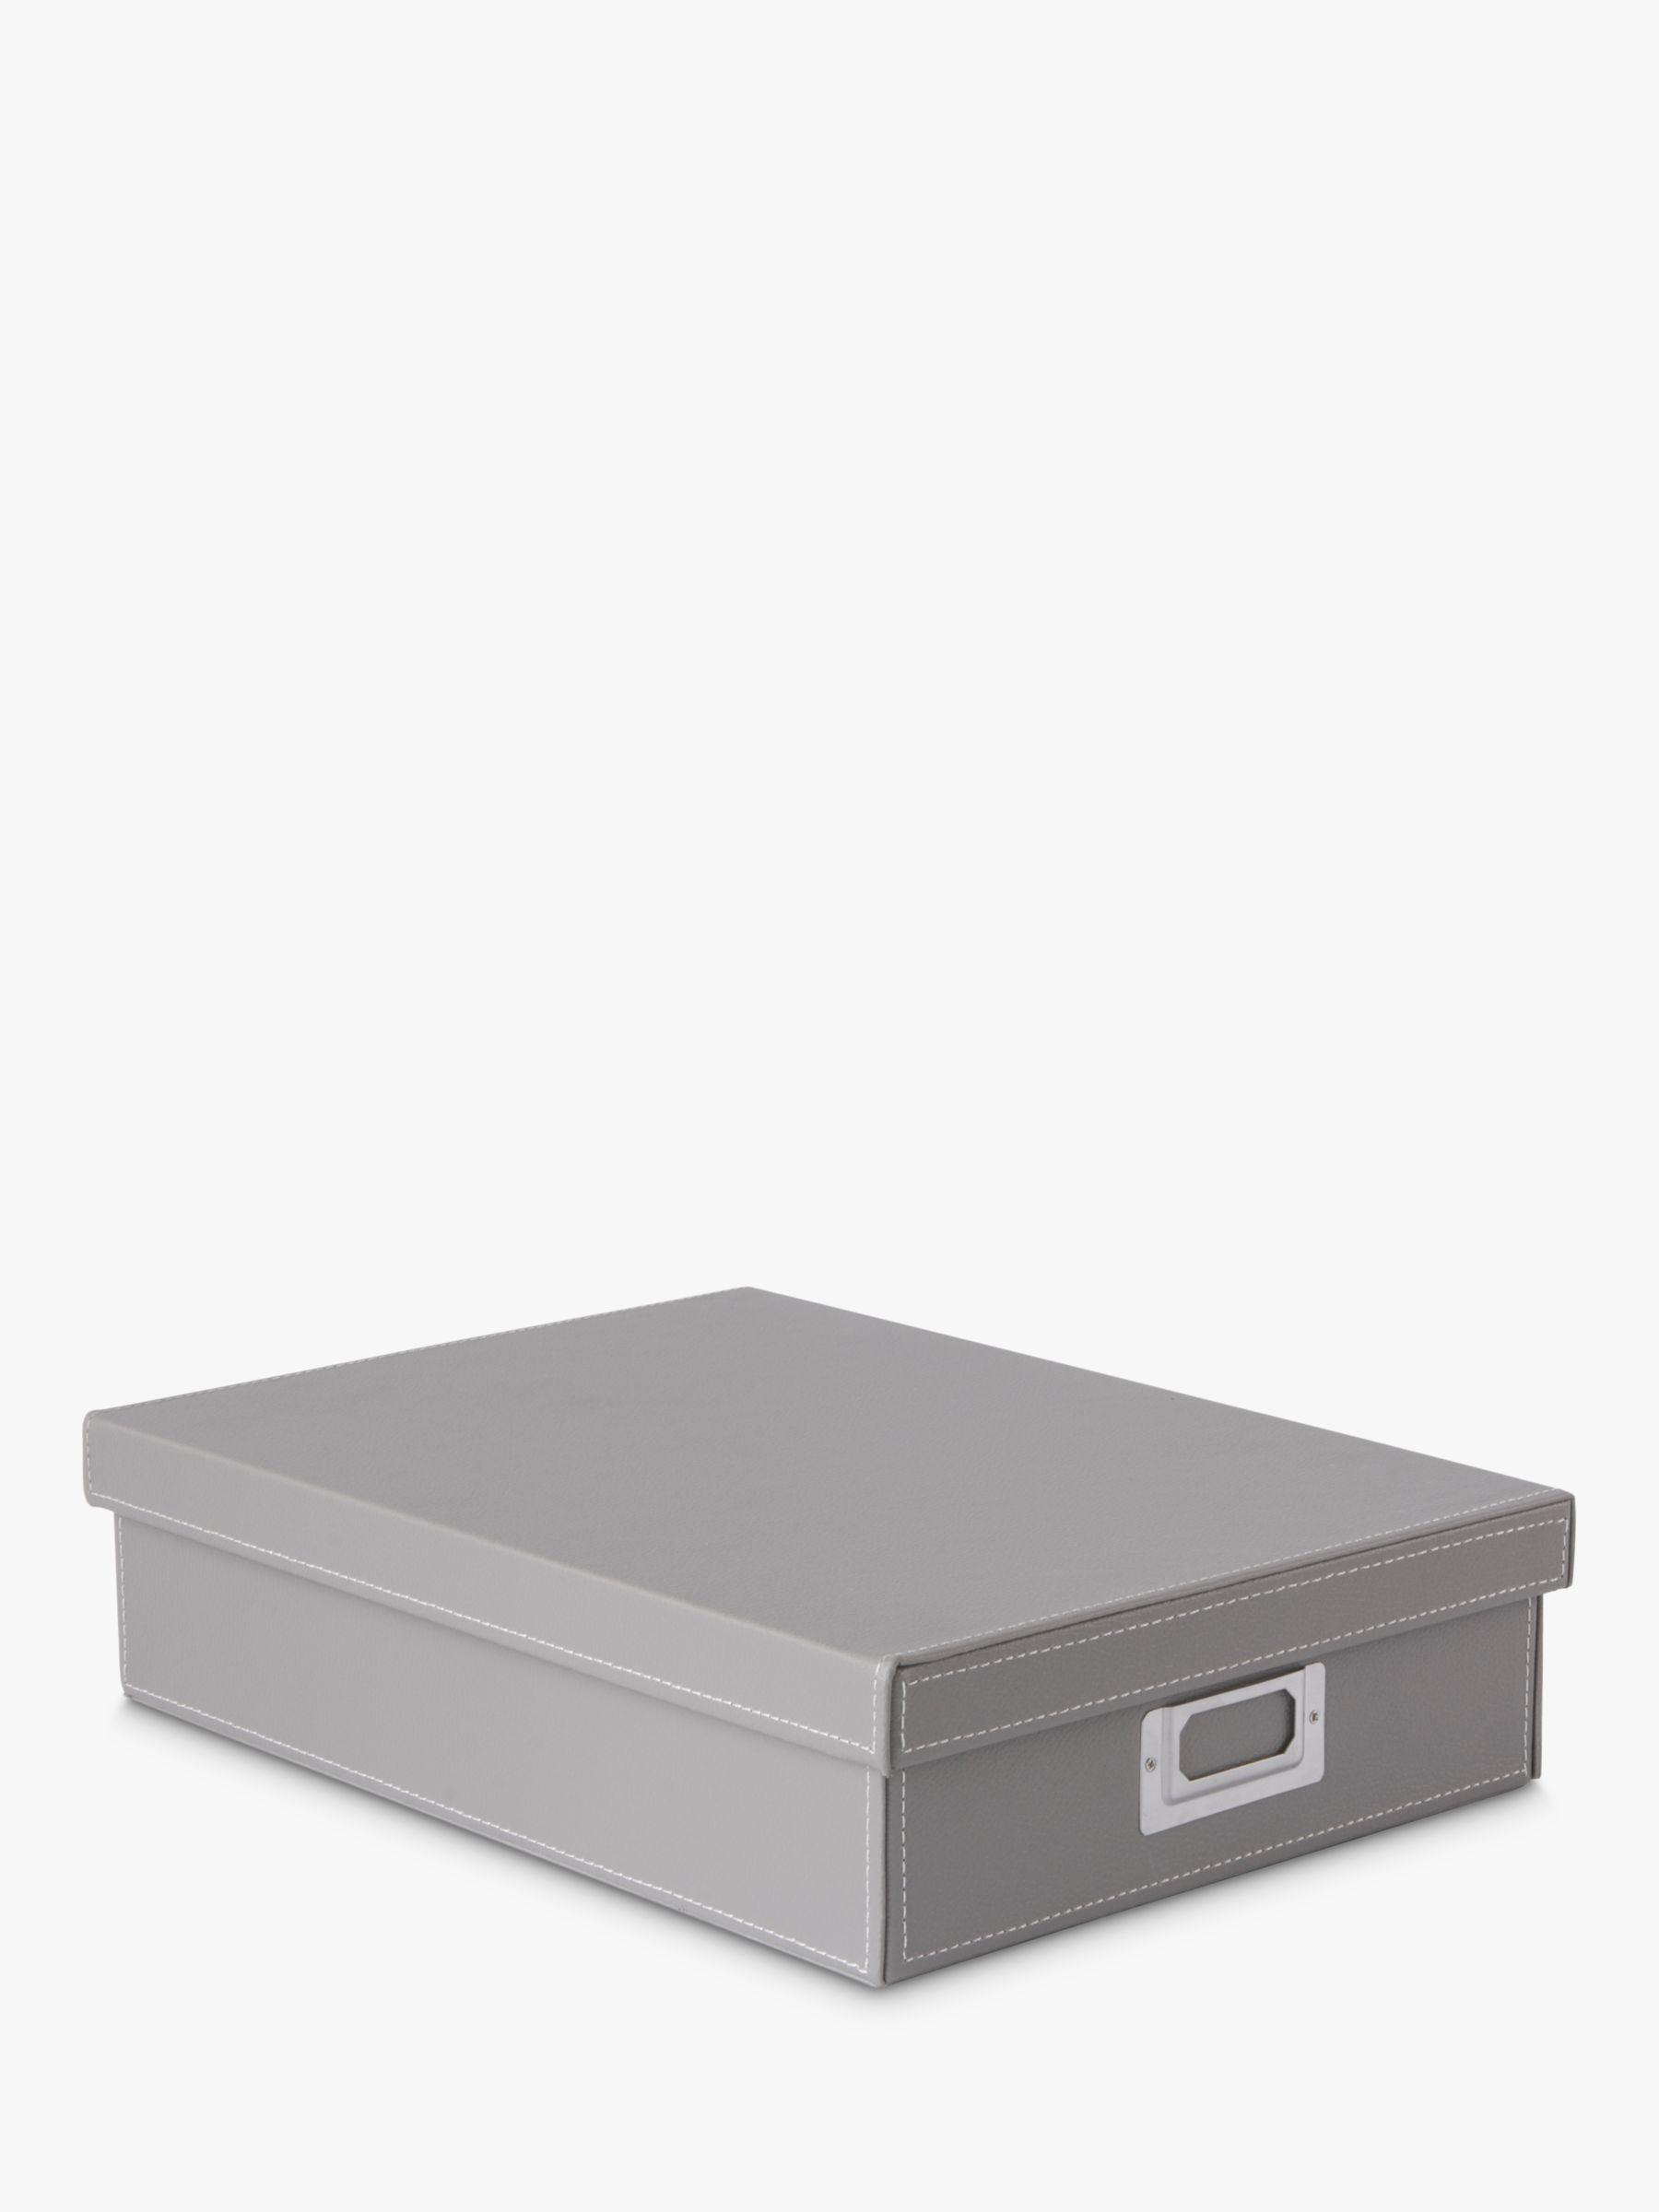 Osco Osco Faux Leather A4 Storage Box